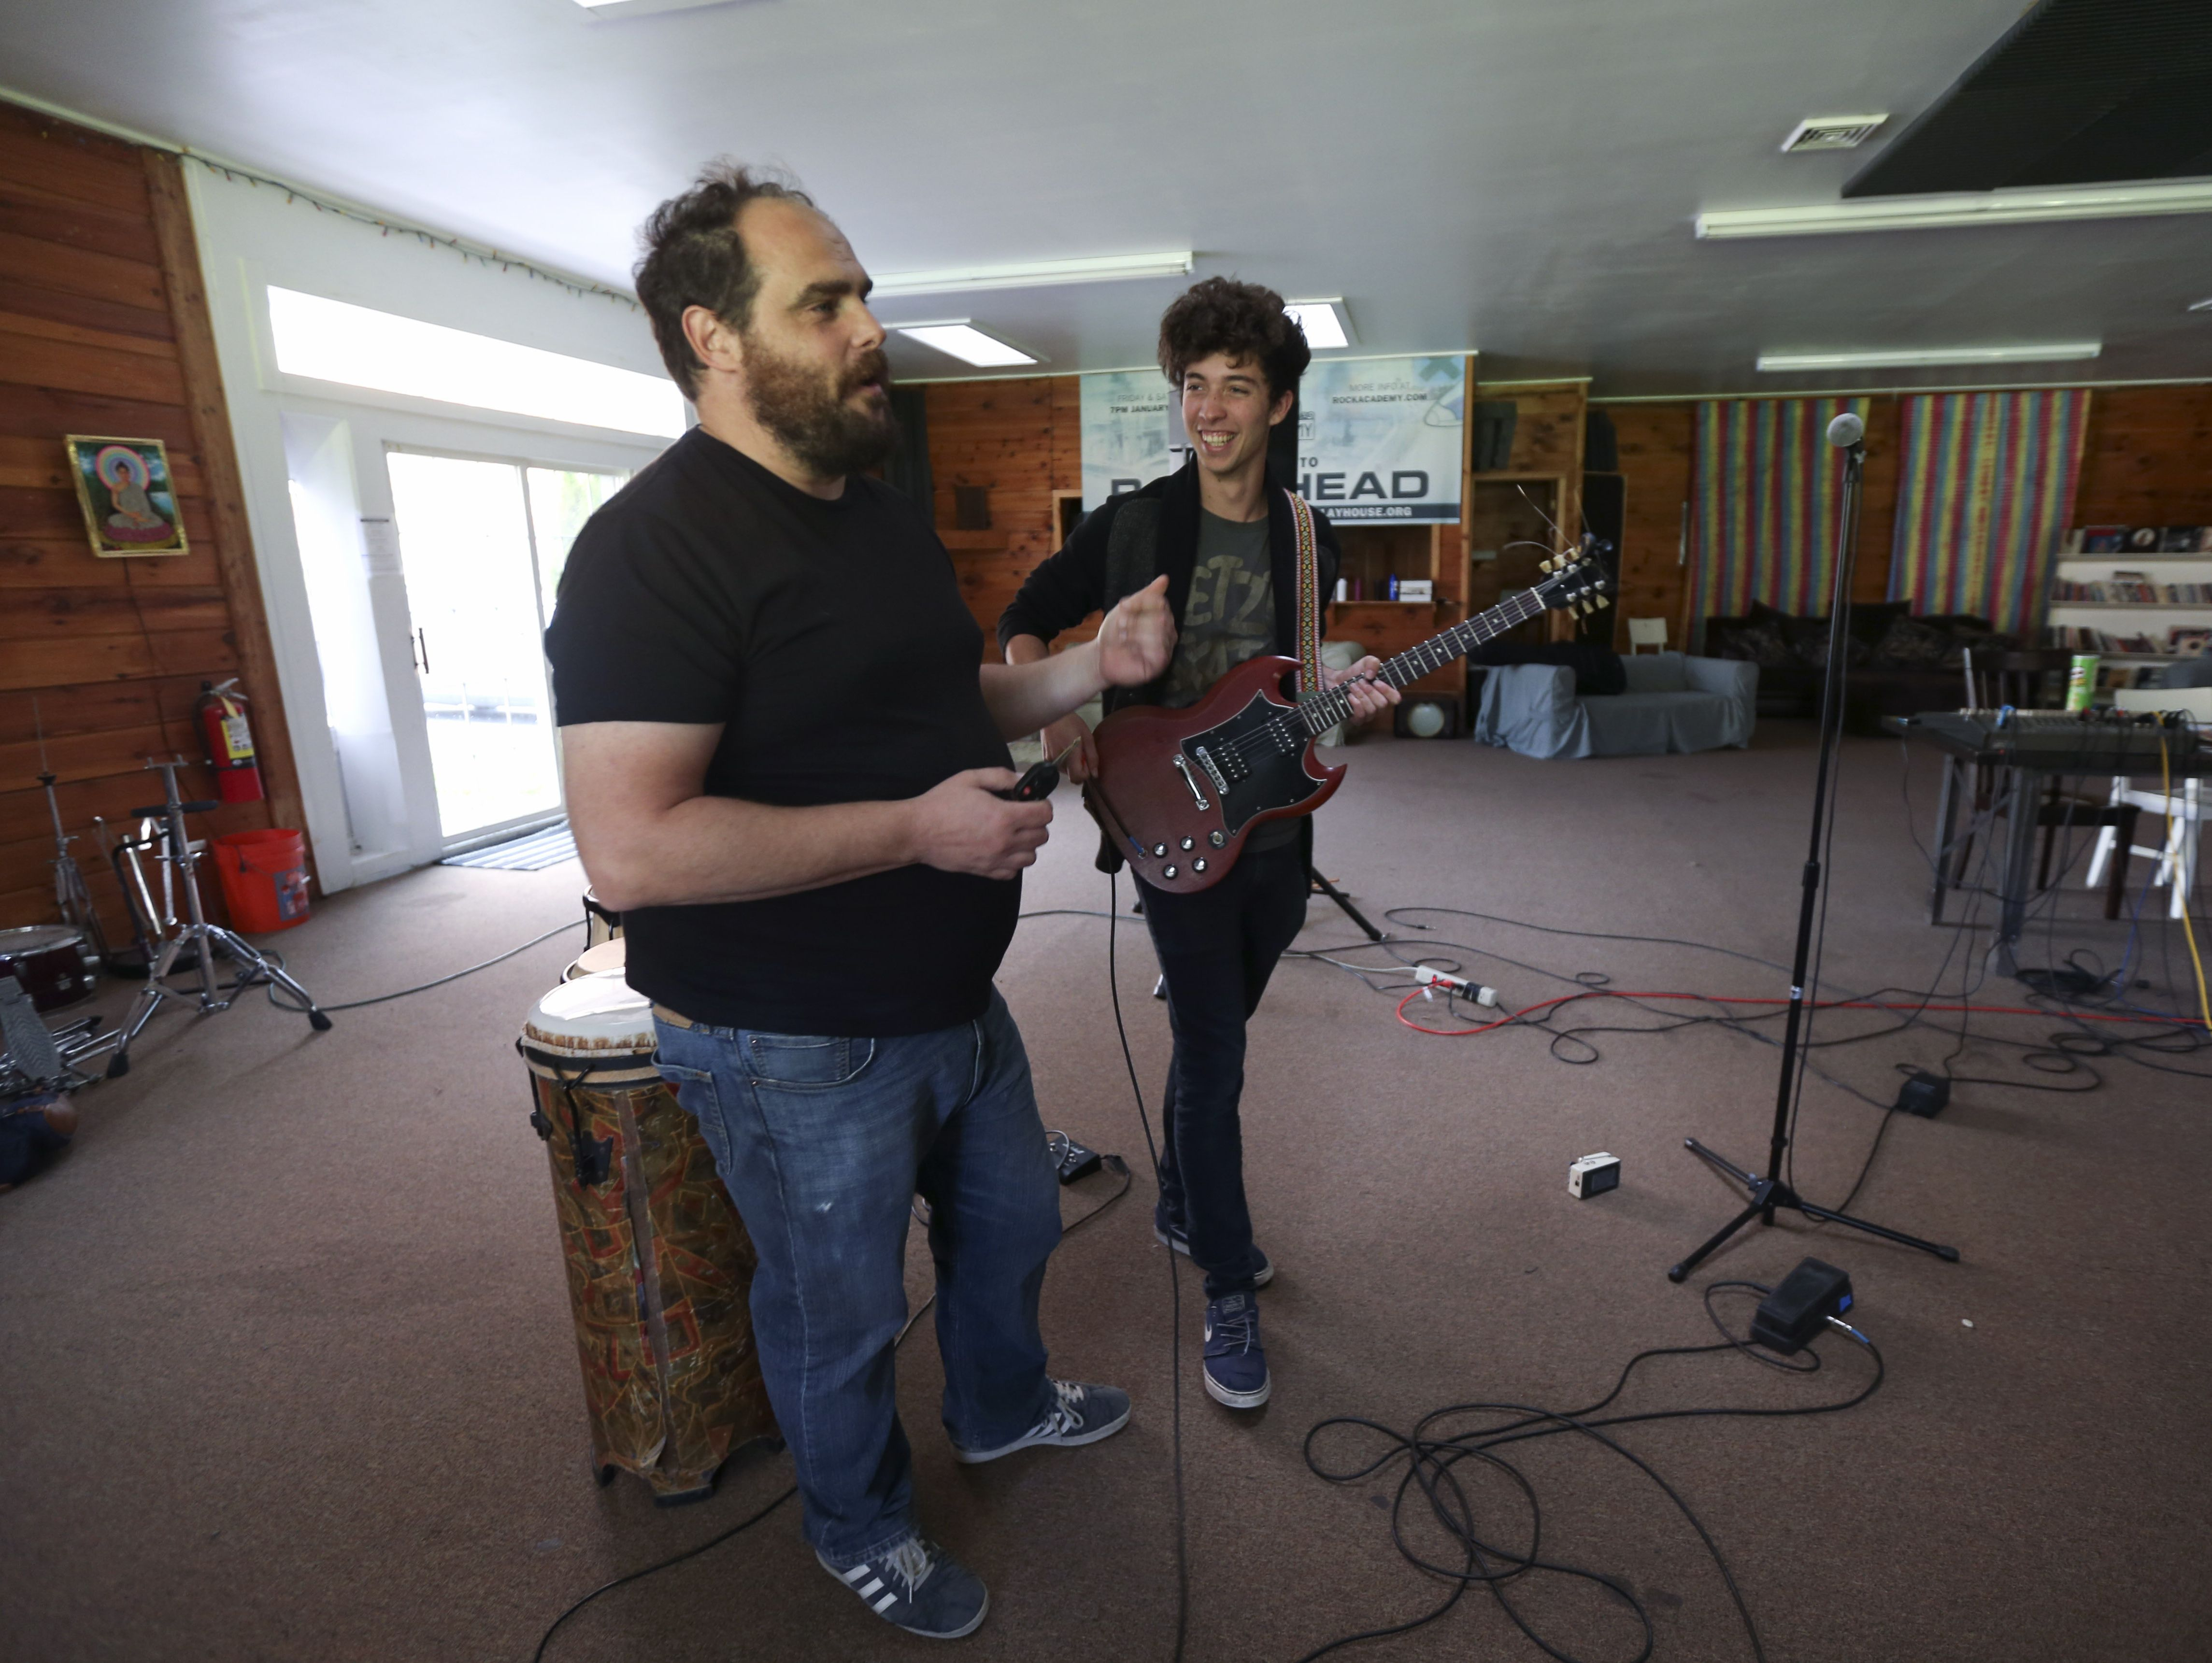 Paul Green, left, talks with student Diggy Lessard, son of Dave Matthews Band bass player Stefan Lessard, at the Paul Green Rock Academy in Saugerties.